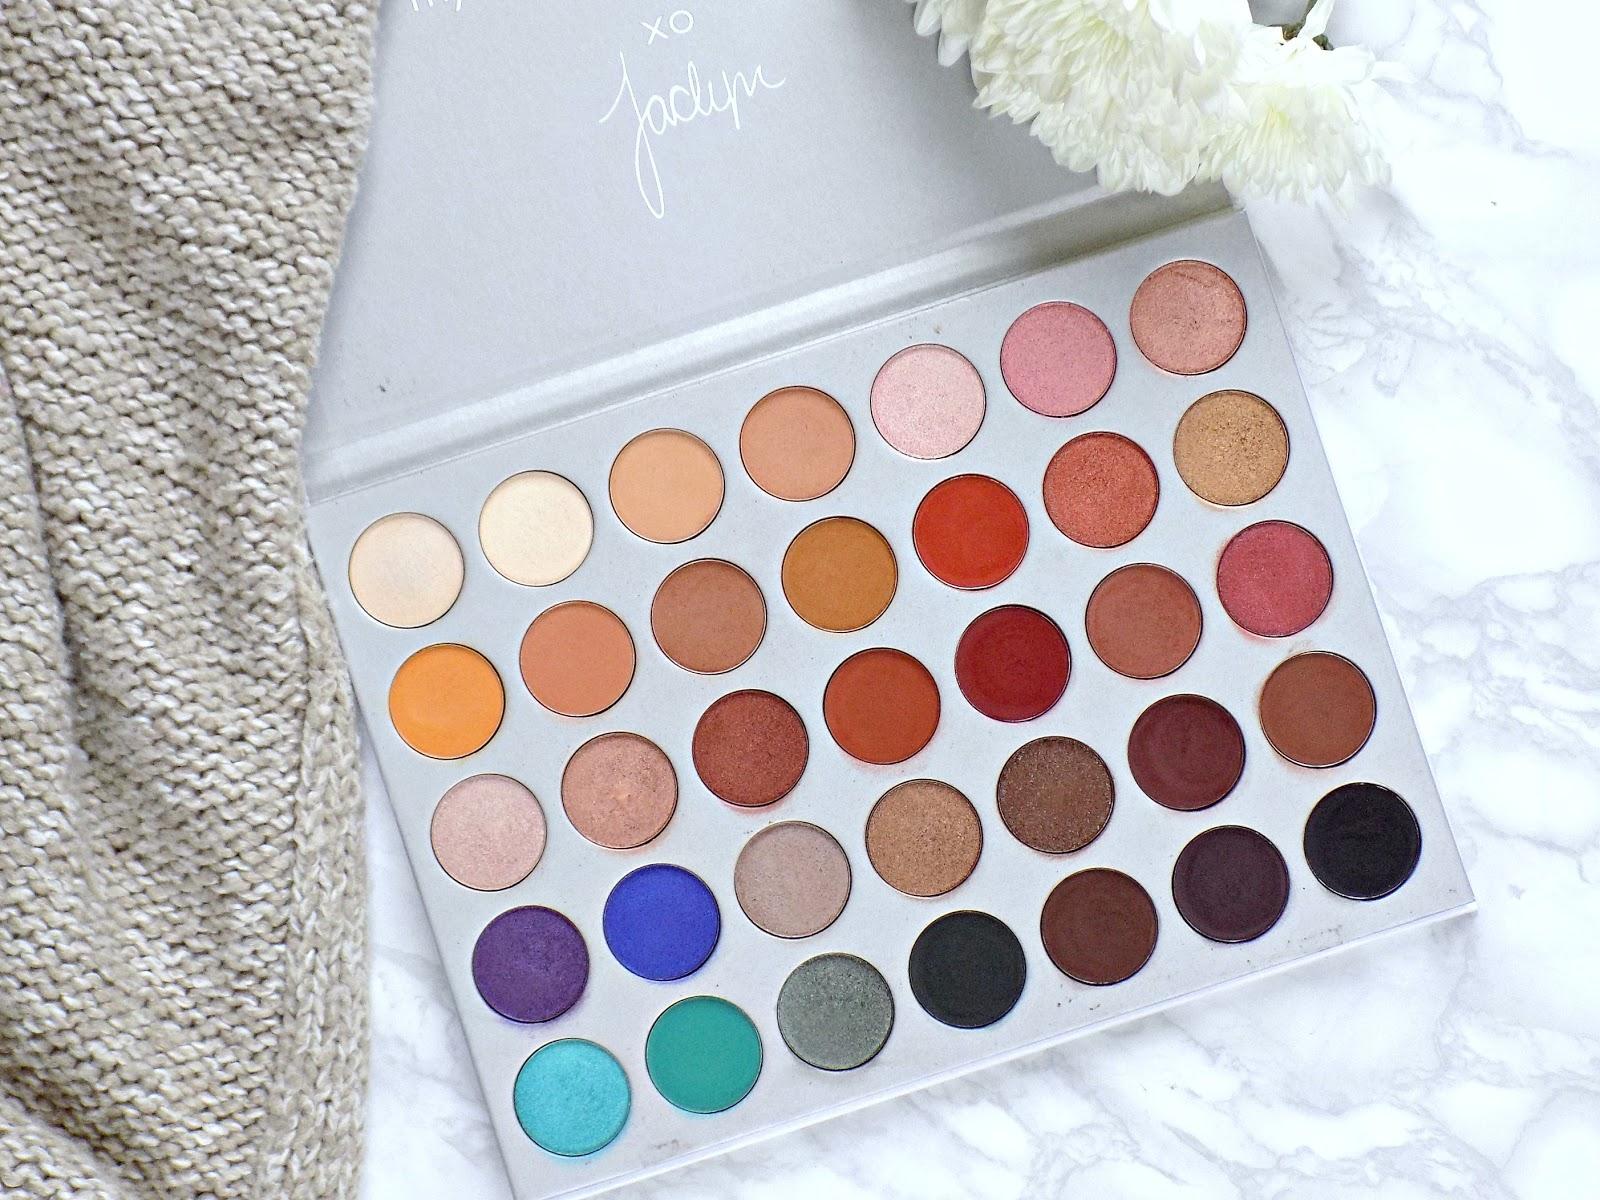 Jaclyn Hill X Morphe eyeshadow palette